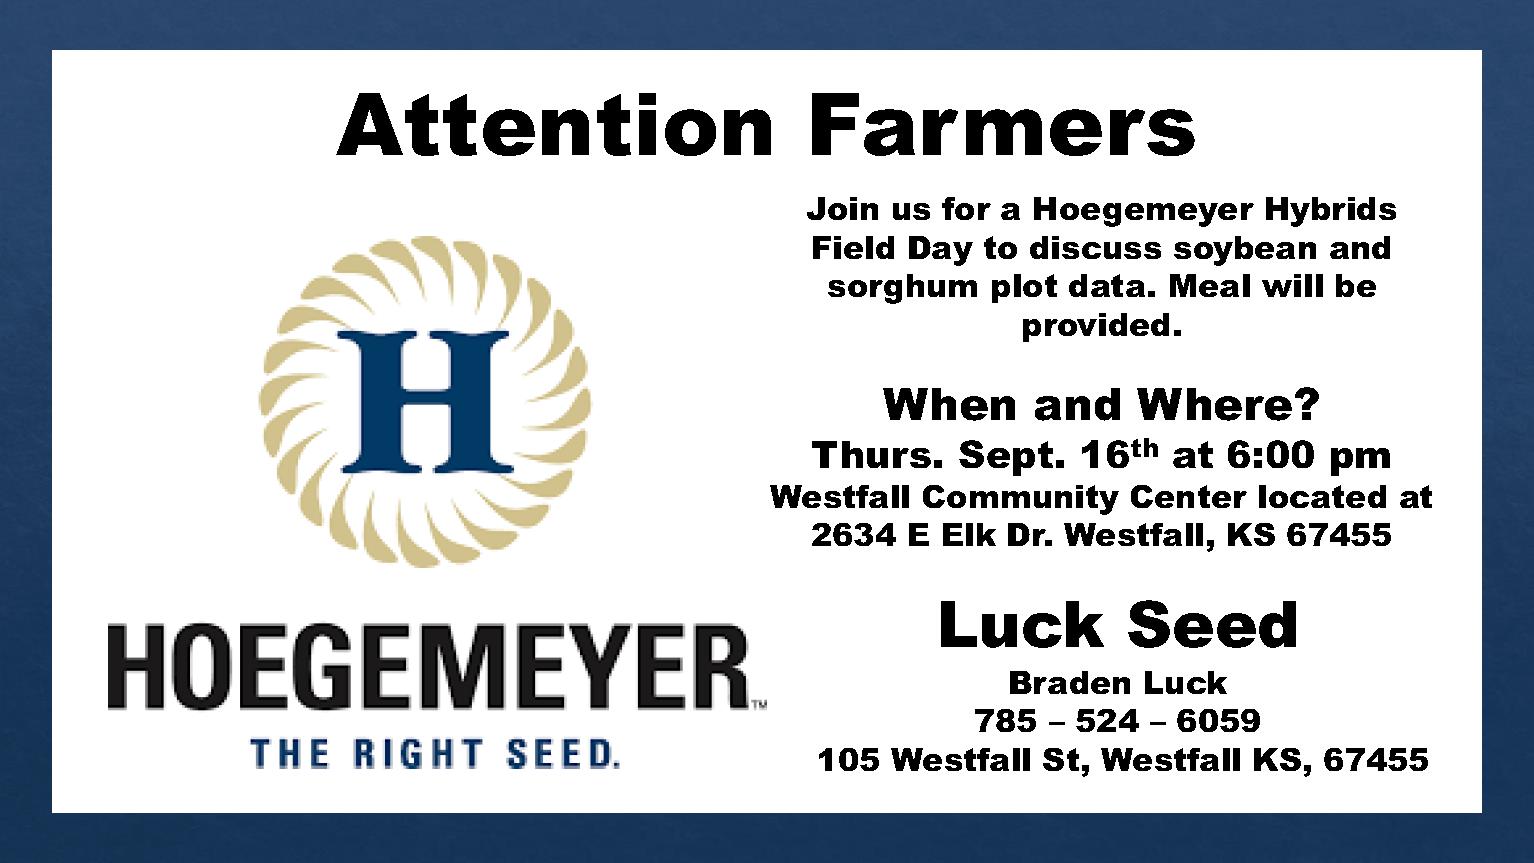 Hoegemeyer Field Day